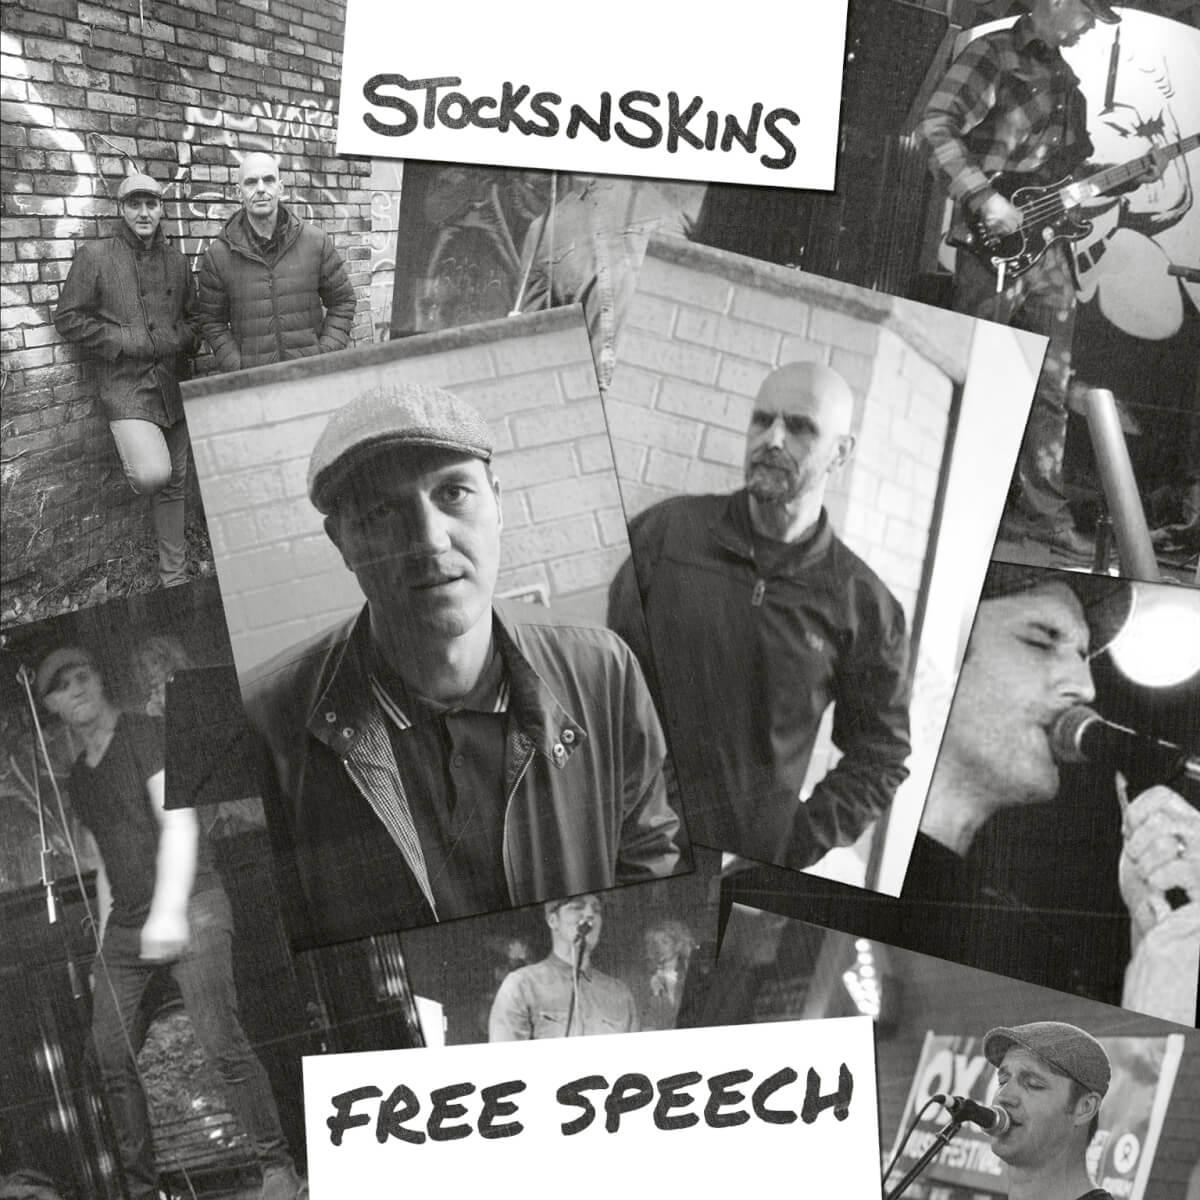 Stocksnskins – Free Speech